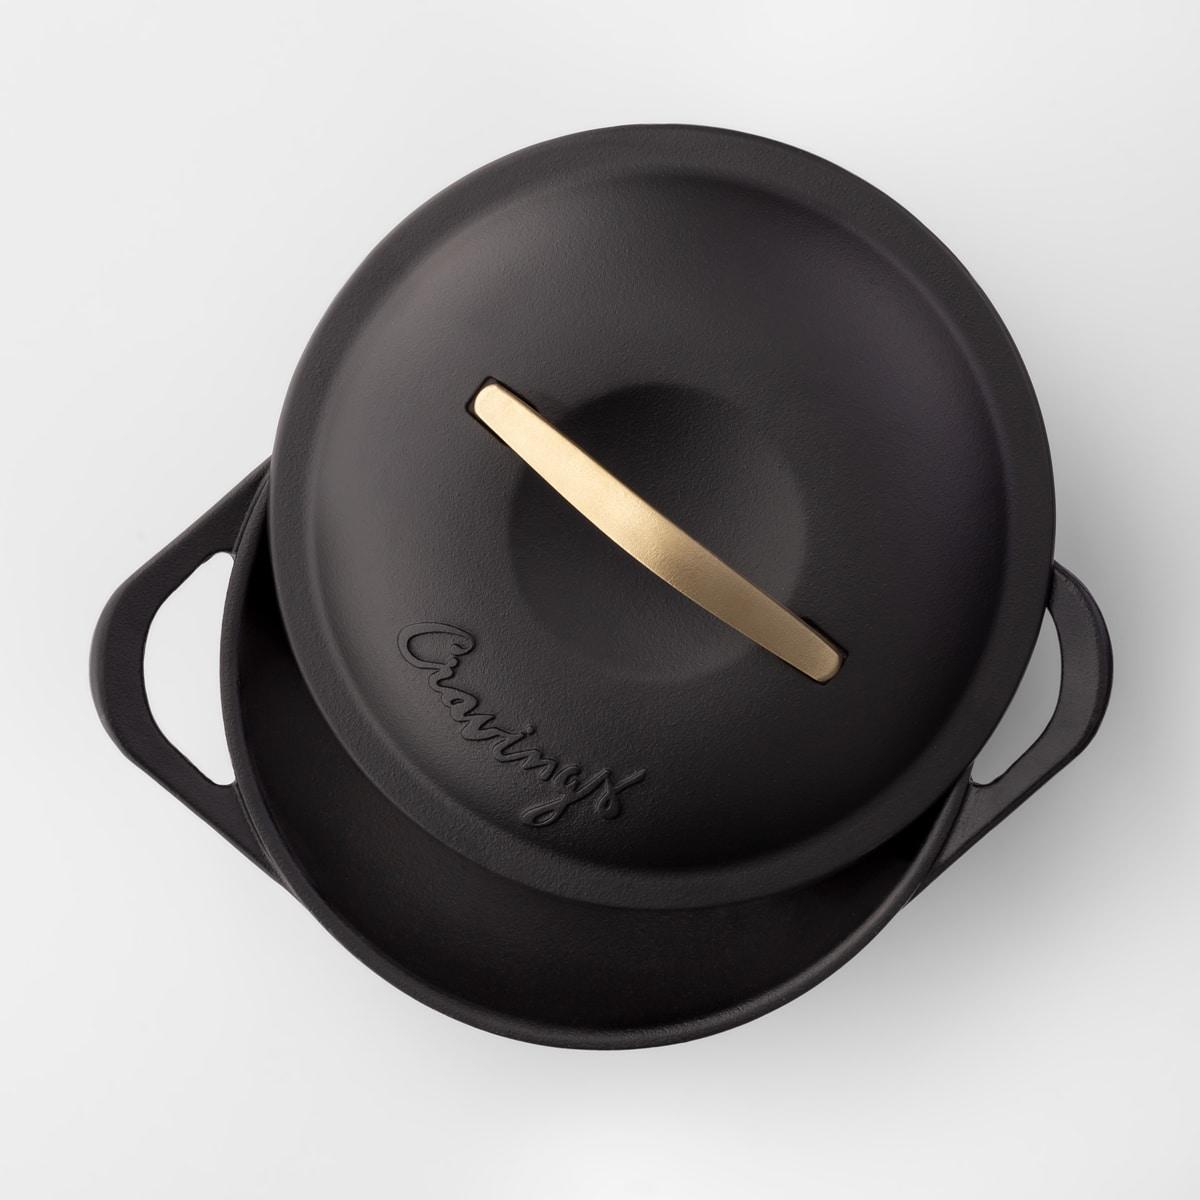 Cravings by Chrissy Teigen cast iron Dutch oven